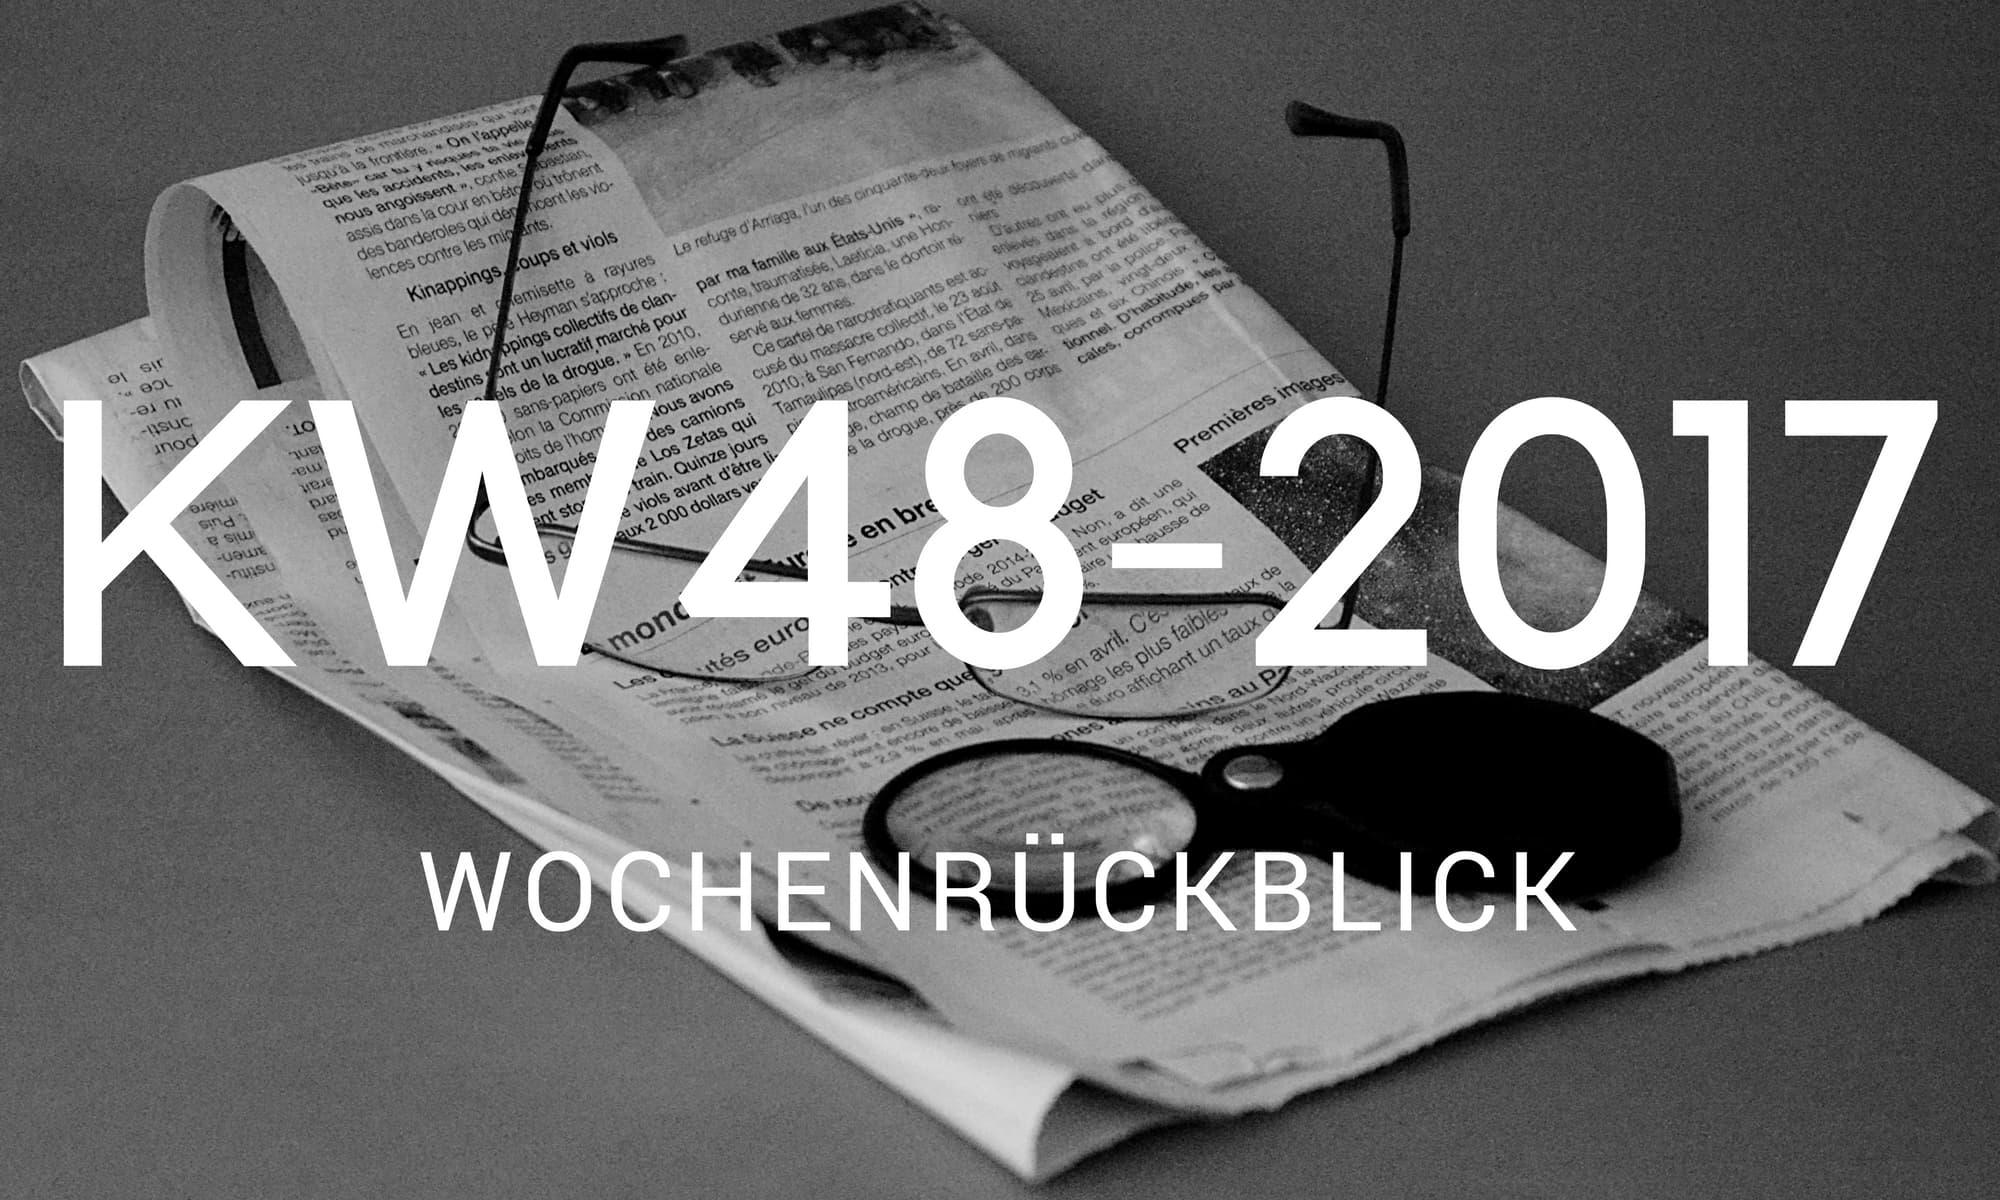 wochenrueckblick camping news KW48/2017